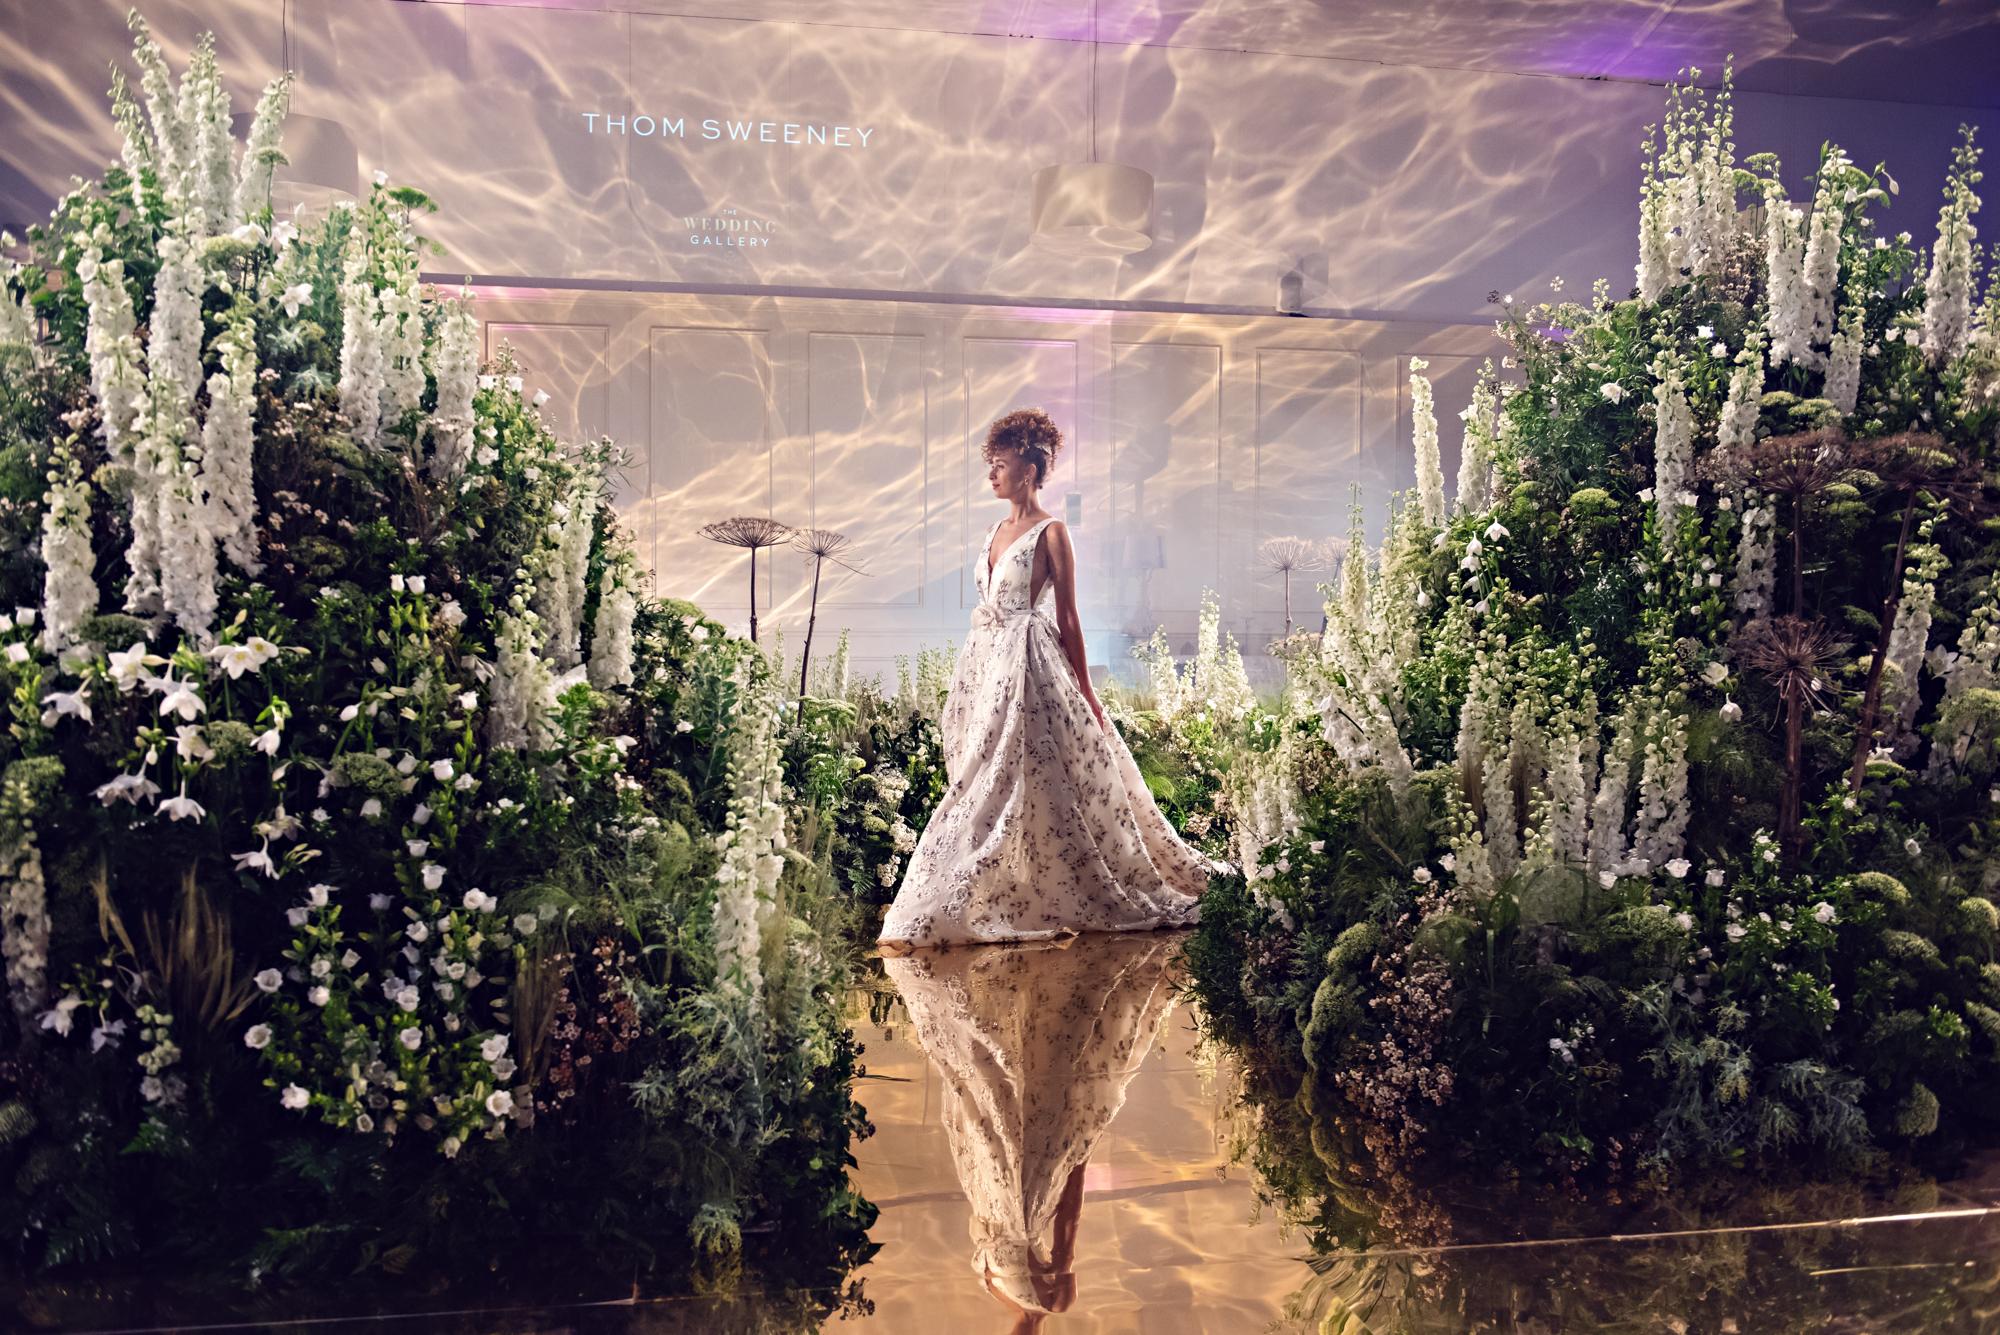 Historic Royal Palaces wedding venues  - An Evening To Remember – Inside The Historic Royal Palaces' Annual Wedding Showcase